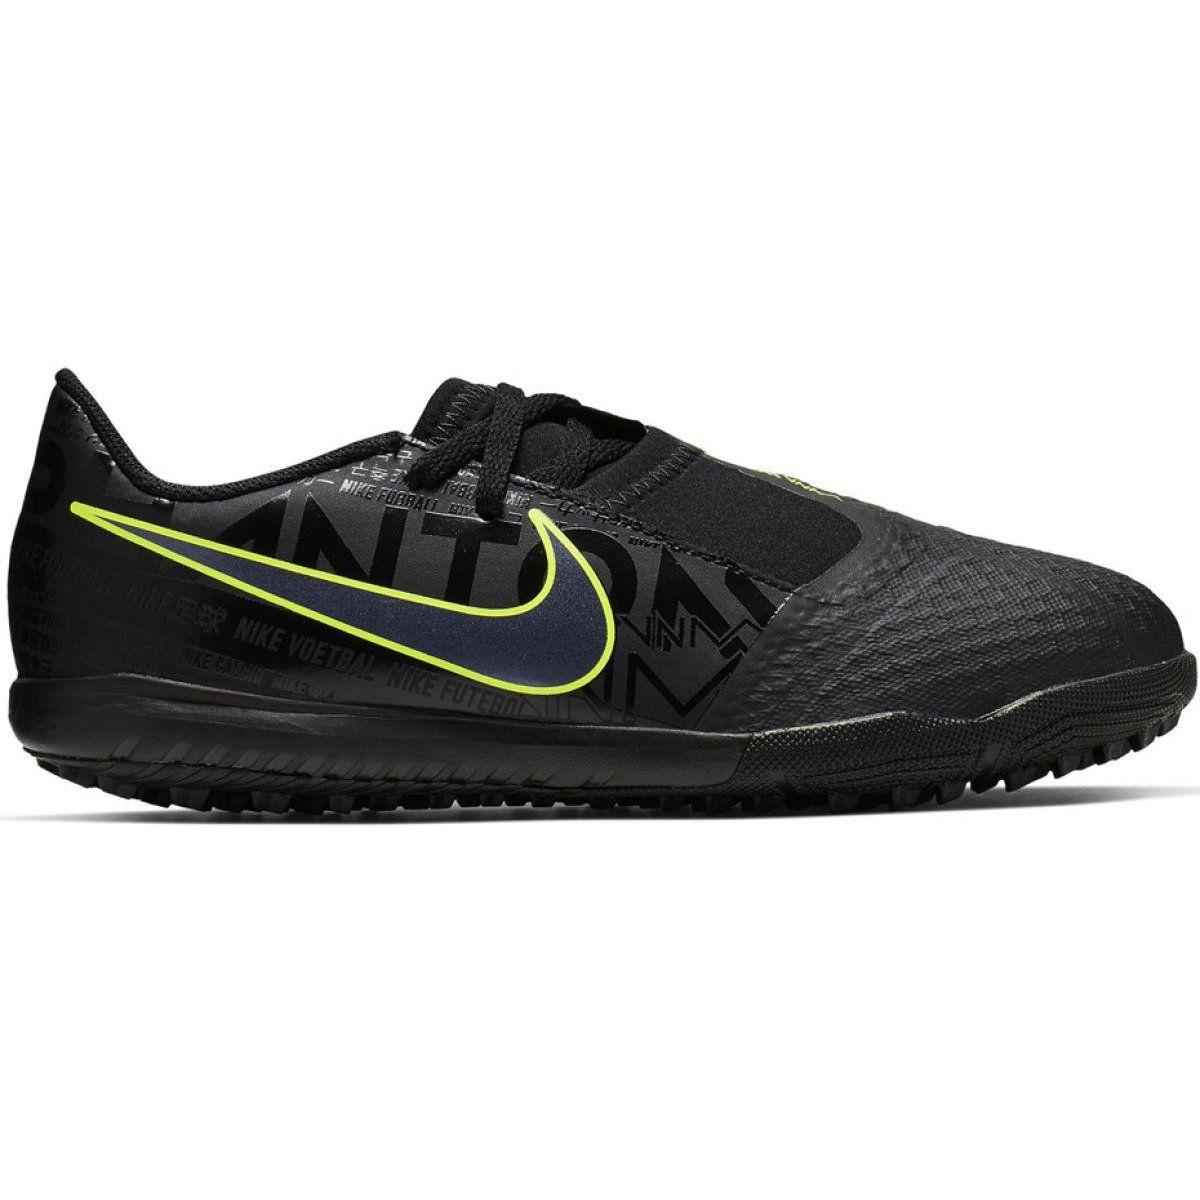 Buty Pilkarskie Nike Phantom Venom Academy Tf Jr Ao0377 007 Czarne Wielokolorowe Soccer Shoe Football Shoes Black Shoes